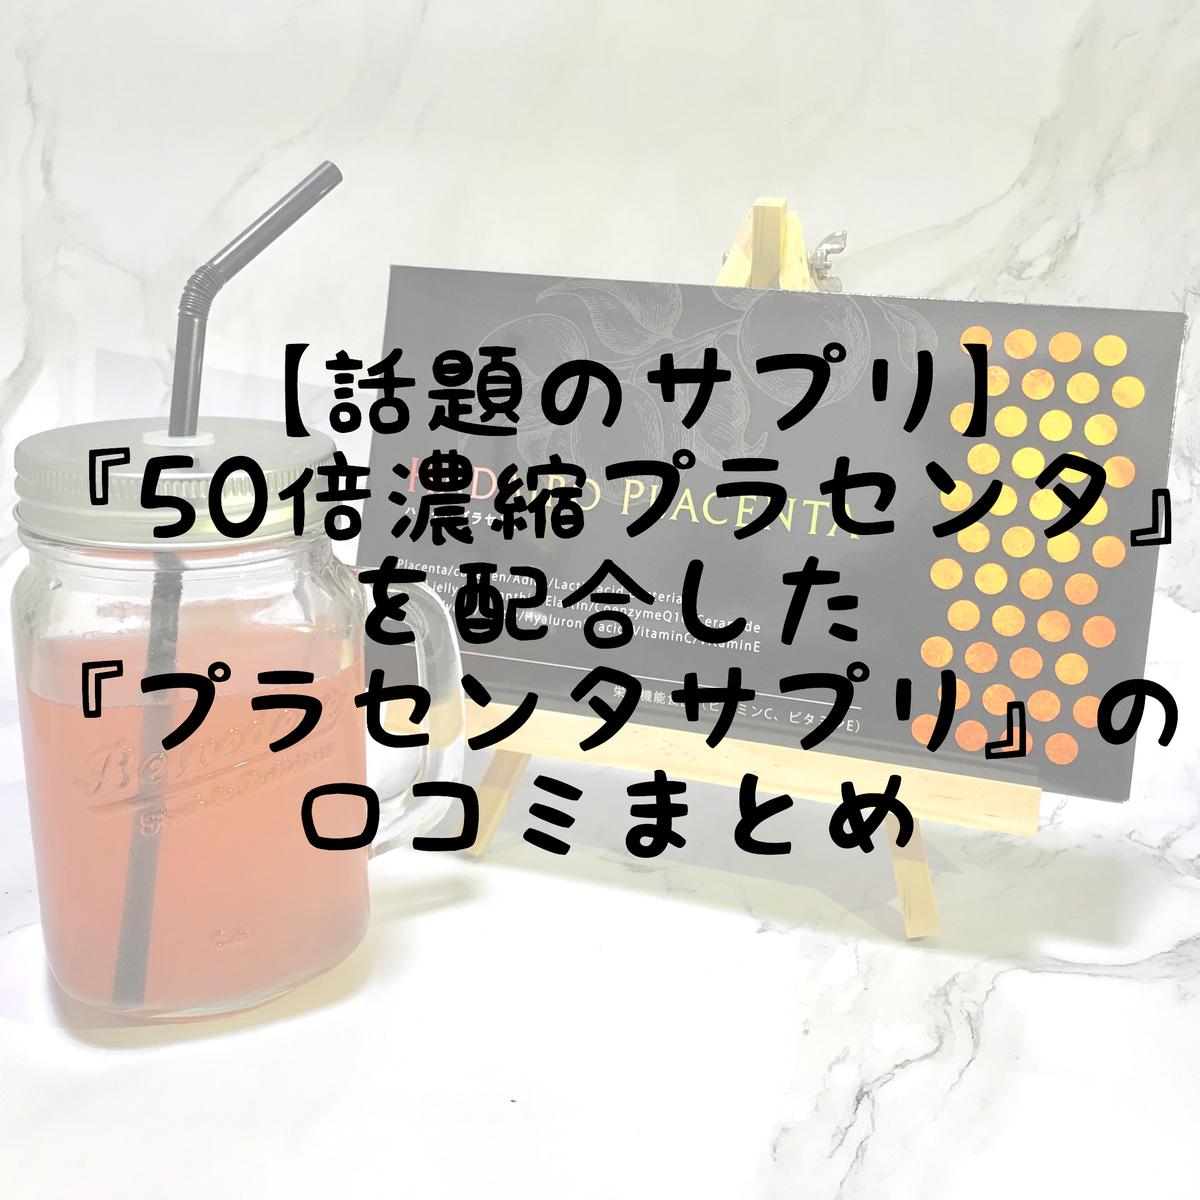 f:id:nokonoko_o:20200519170027j:plain